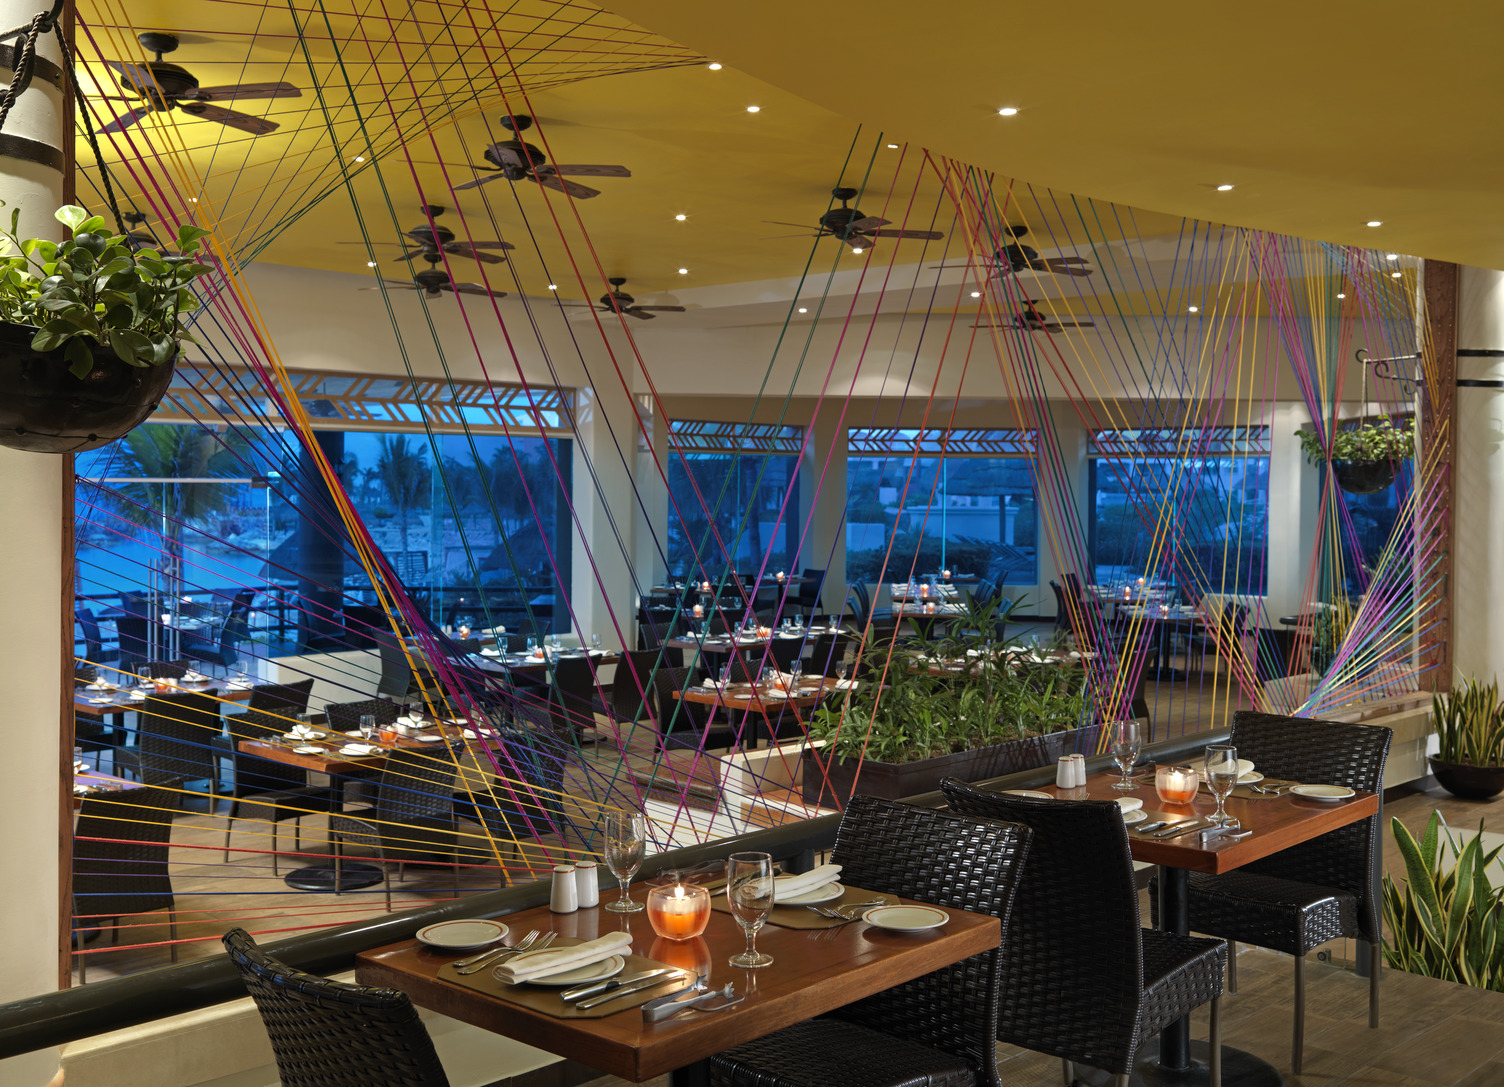 Travel Agency All-Inclusive Resort Heaven at Hard Rock Hotel Riviera Maya 44